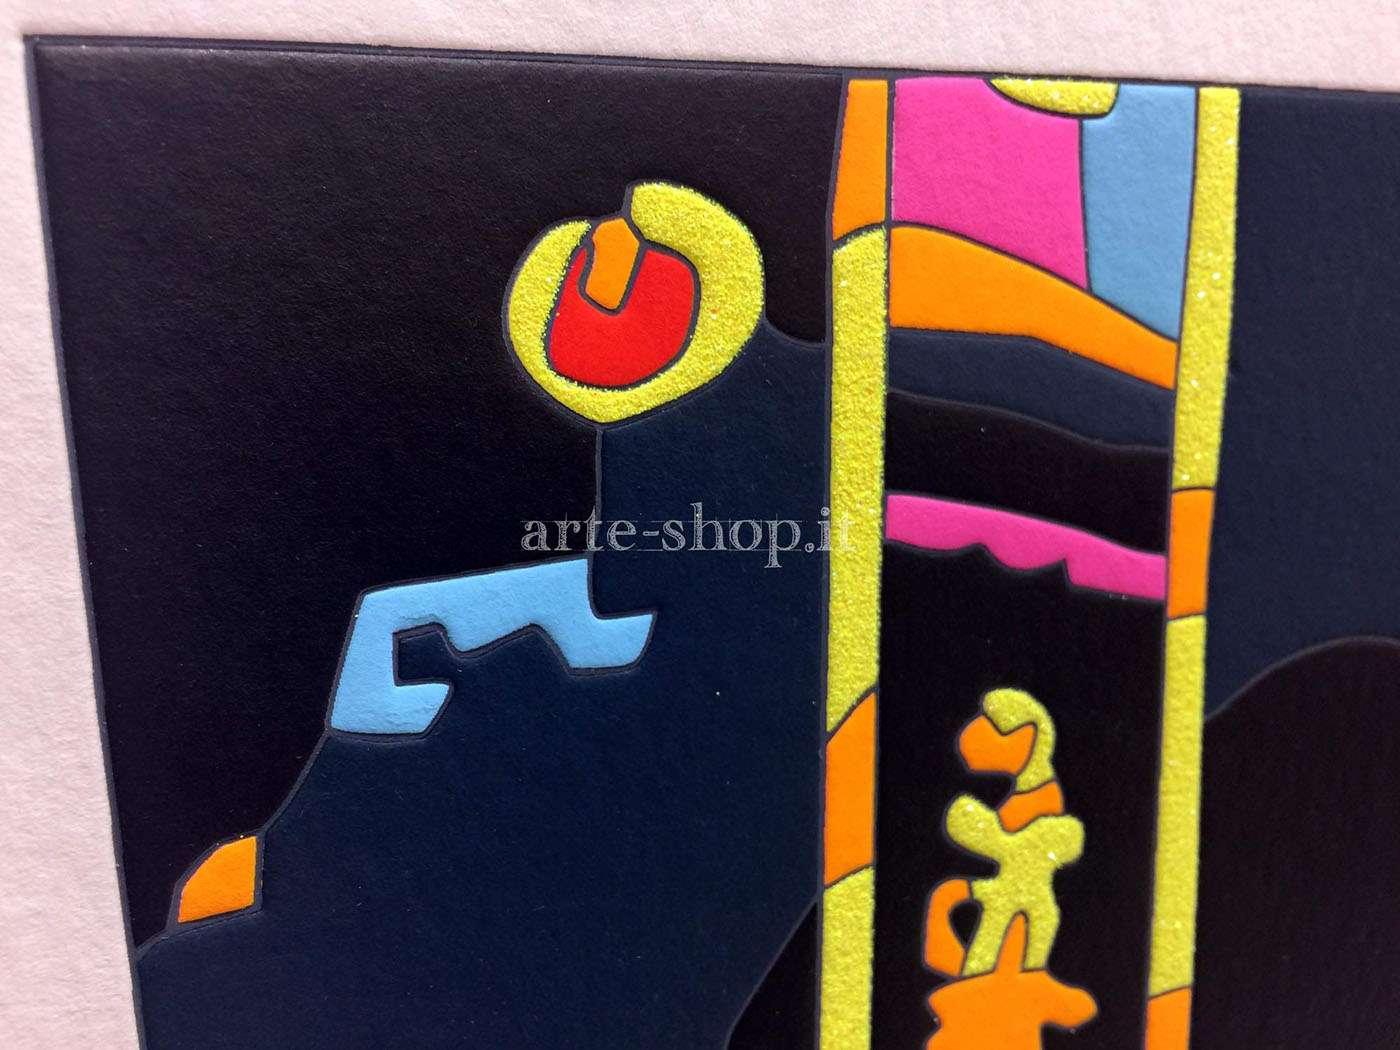 arte pentagono shop dettaglio numero 228